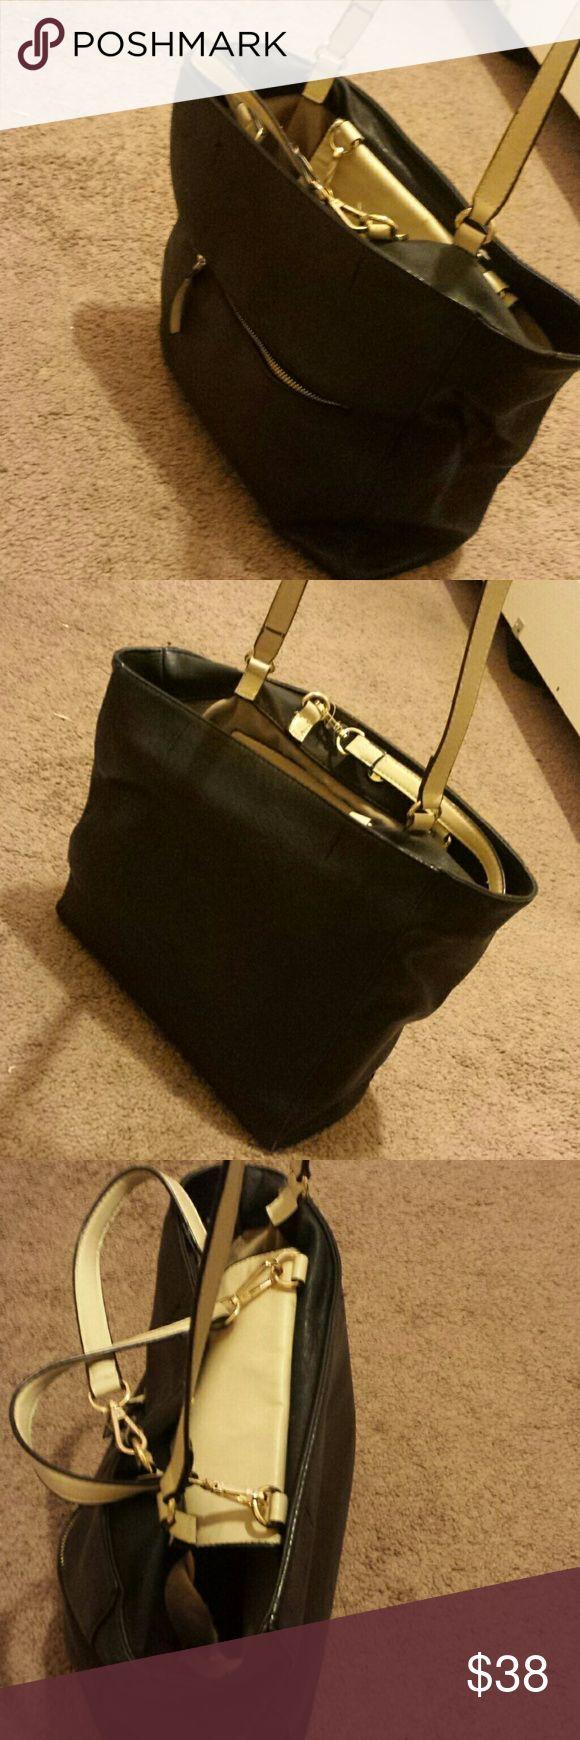 Zara tote bag Zara tote bag,  two pockets on the inside,  one zipped pocket on the outside. Black leather feel. Gently used. Zara Bags